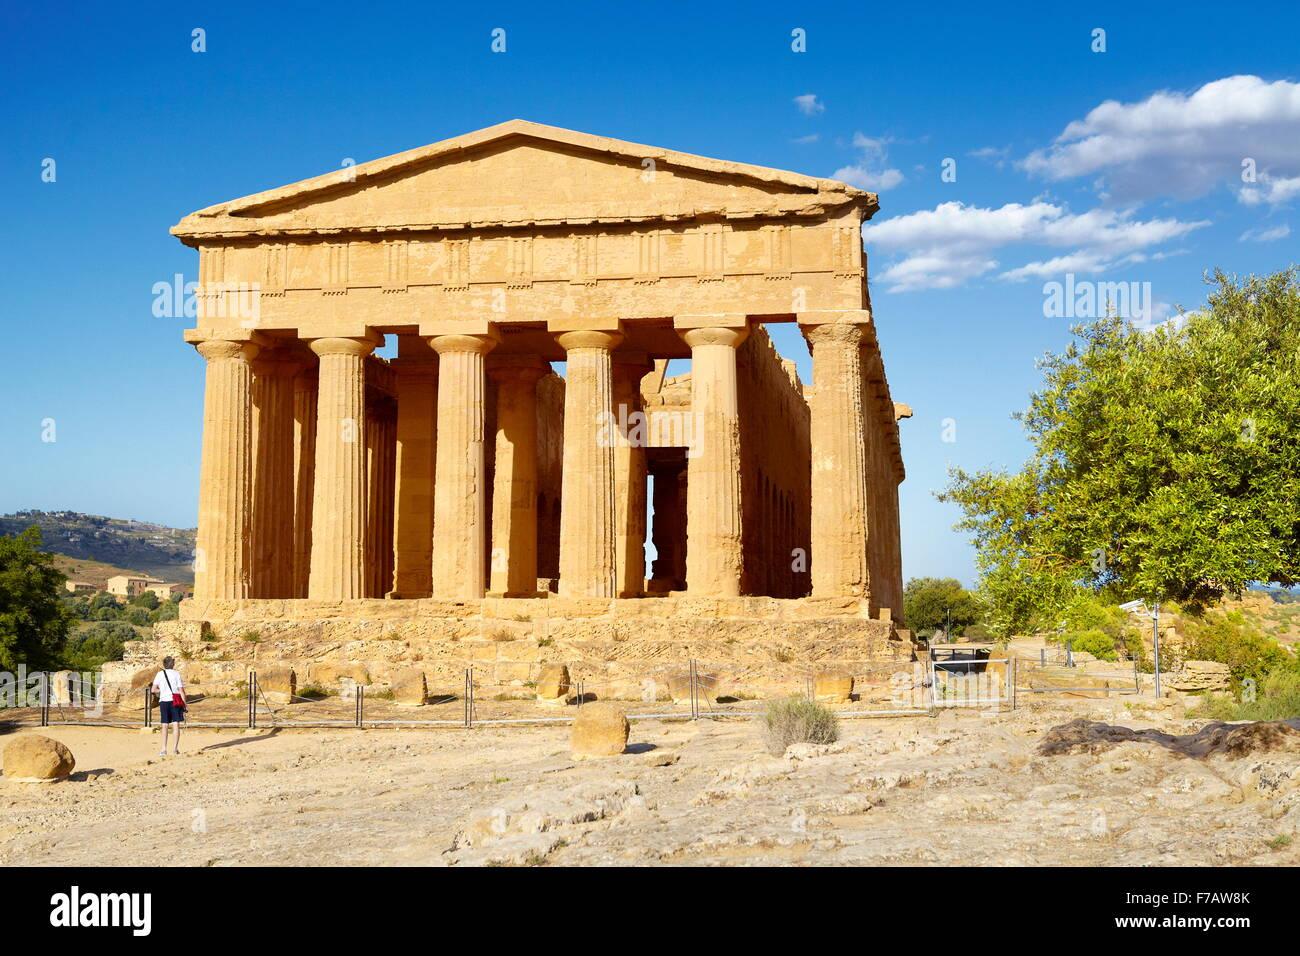 Sicily Island - Temple of Concordia, Vallée des Temples (Valle dei Templi, Agrigento, Italie) l'UNESCO Photo Stock